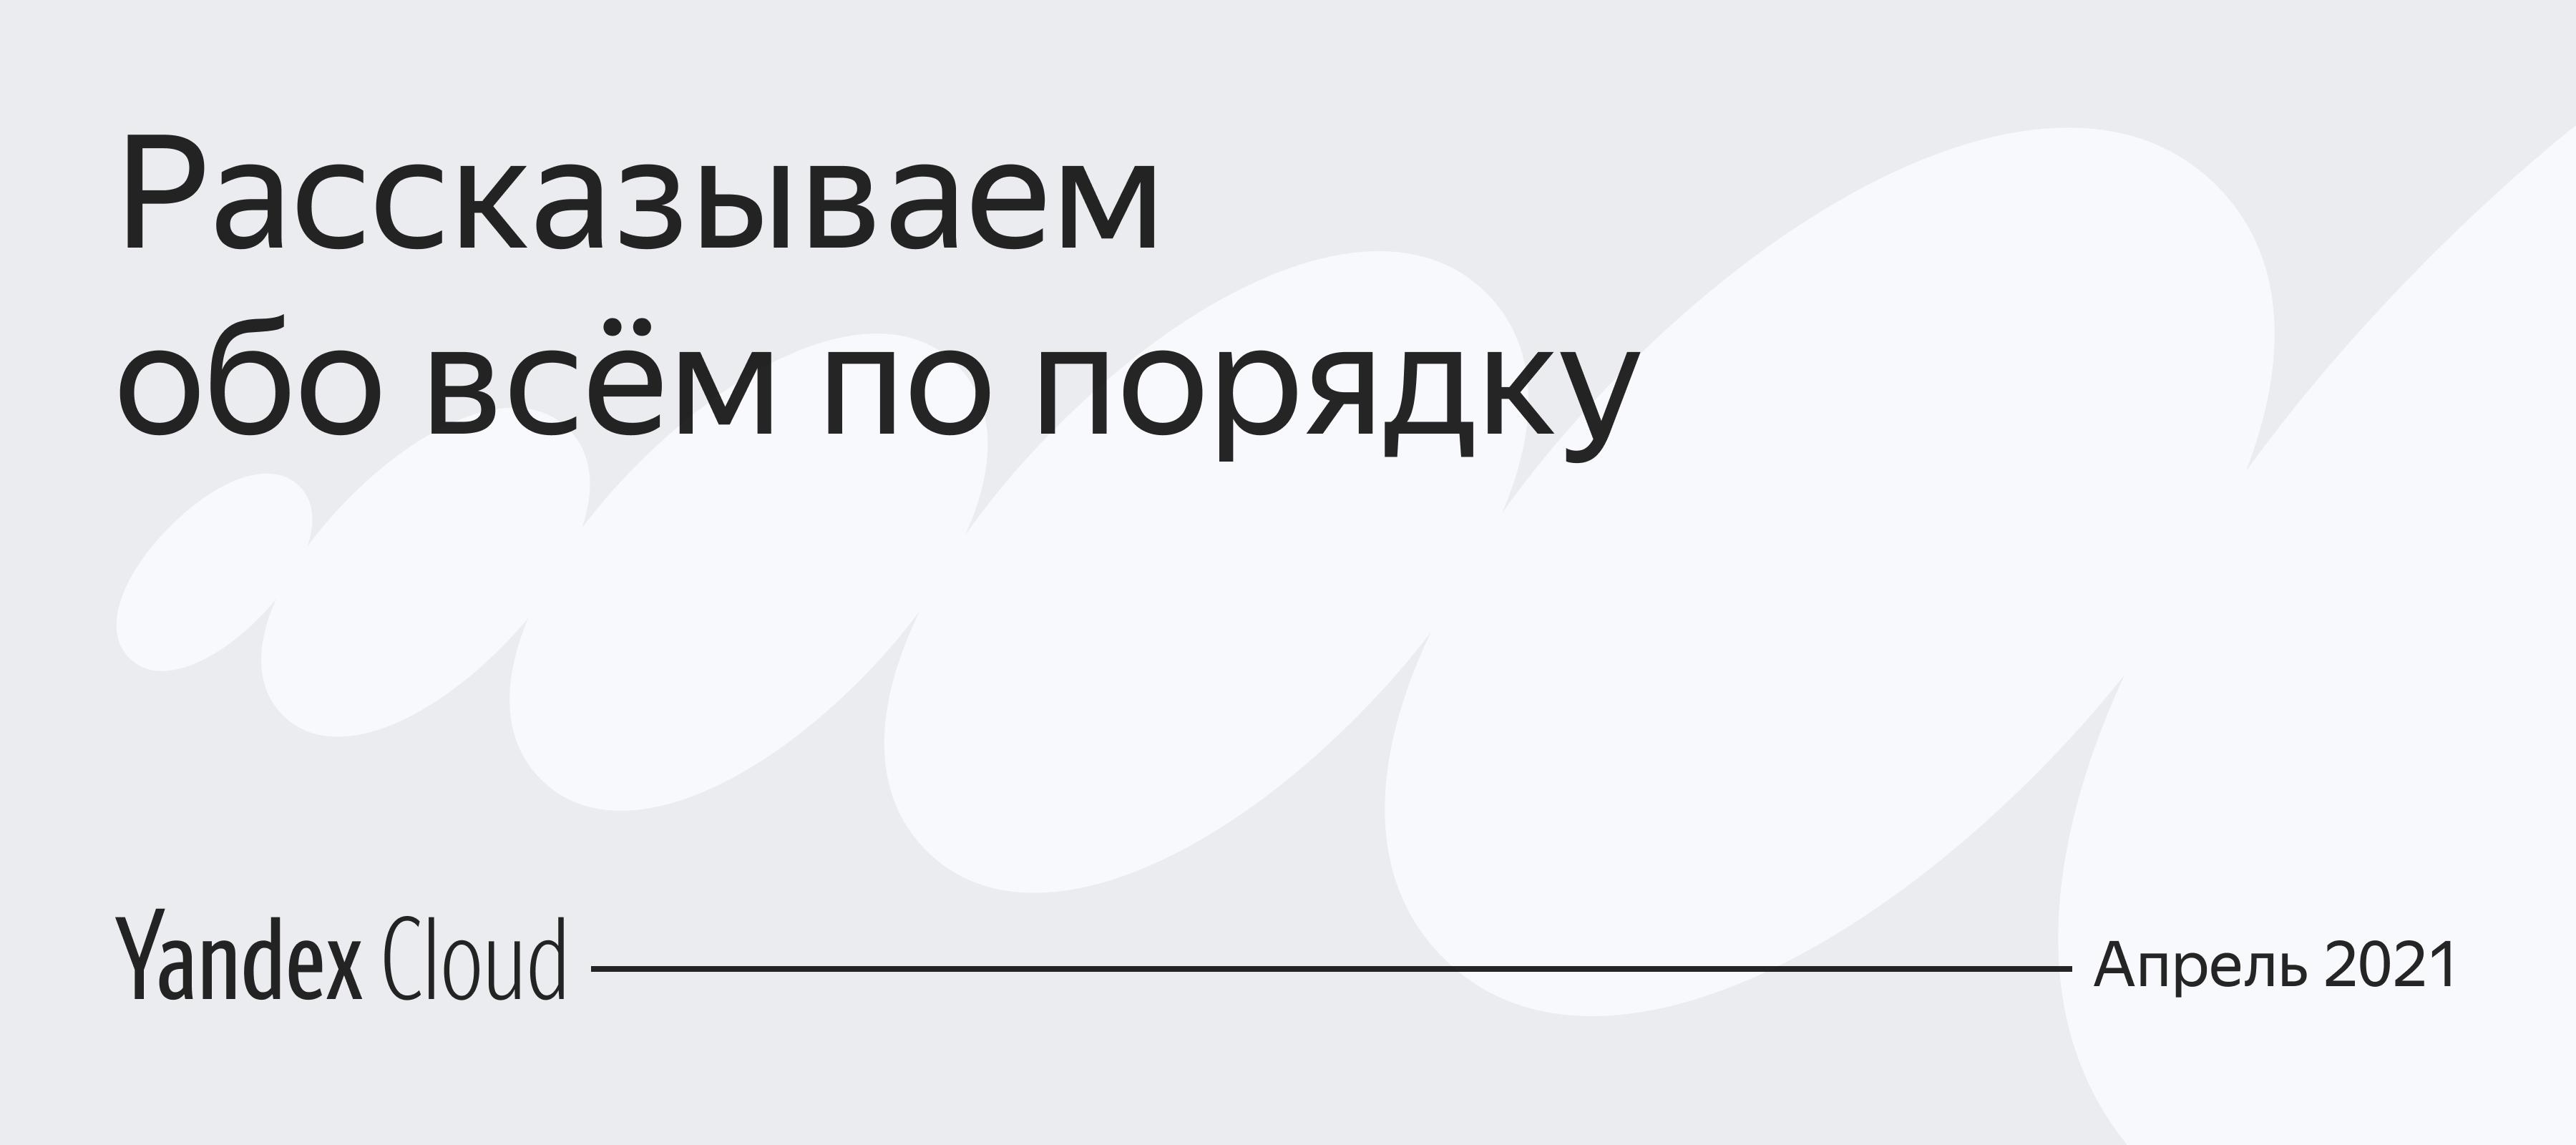 Yandex.Cloud news digest March 2021